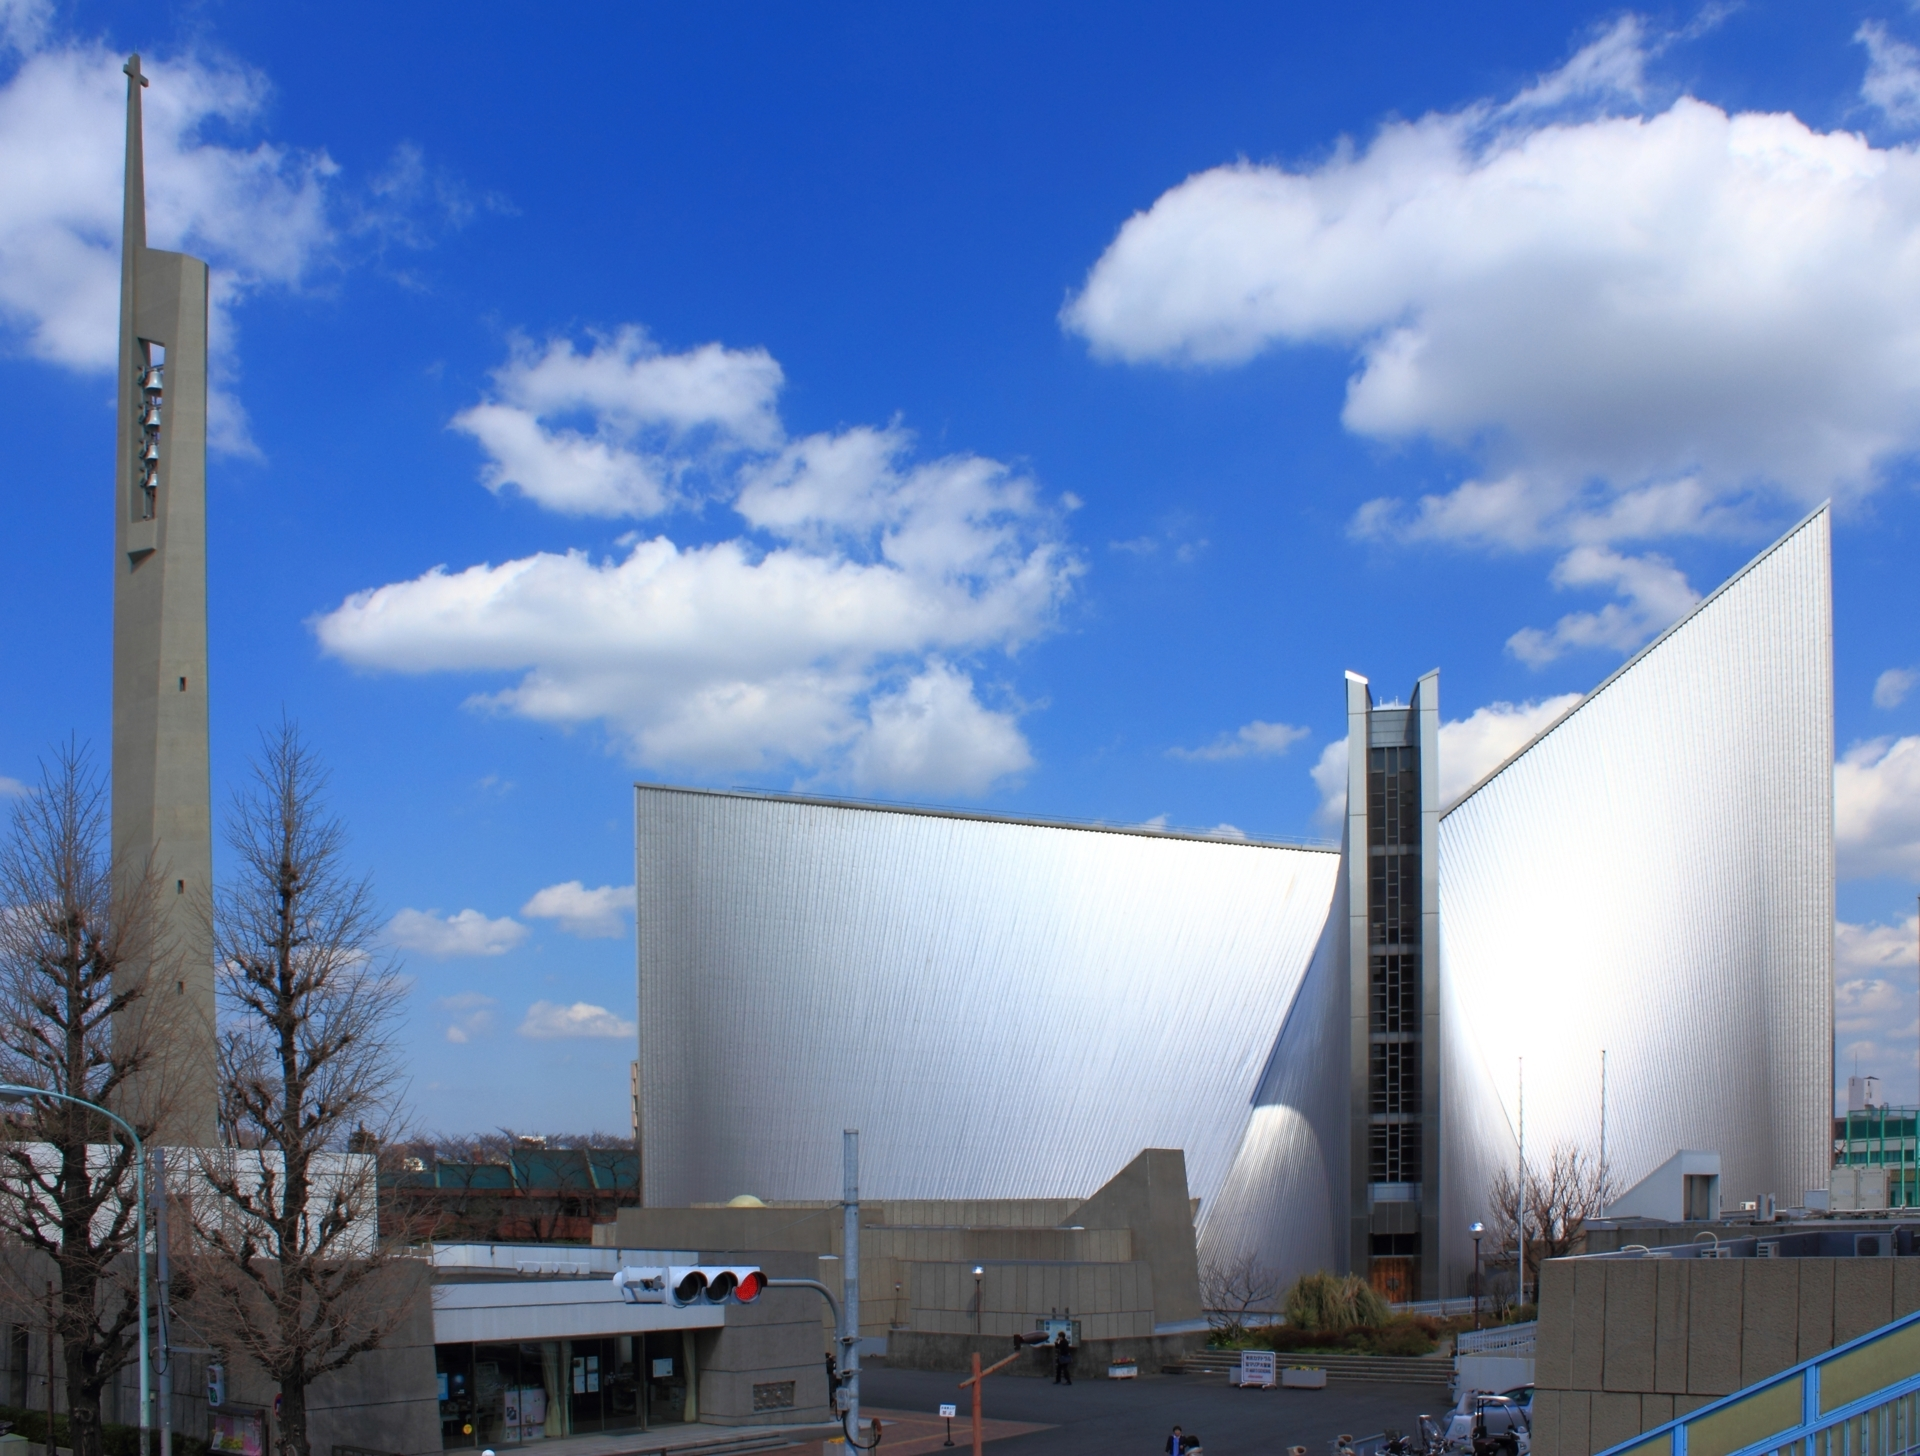 1-kenzo-tange-st-_marys_cathedral_tokyo_2012-kenzo-tange-fileminimizer